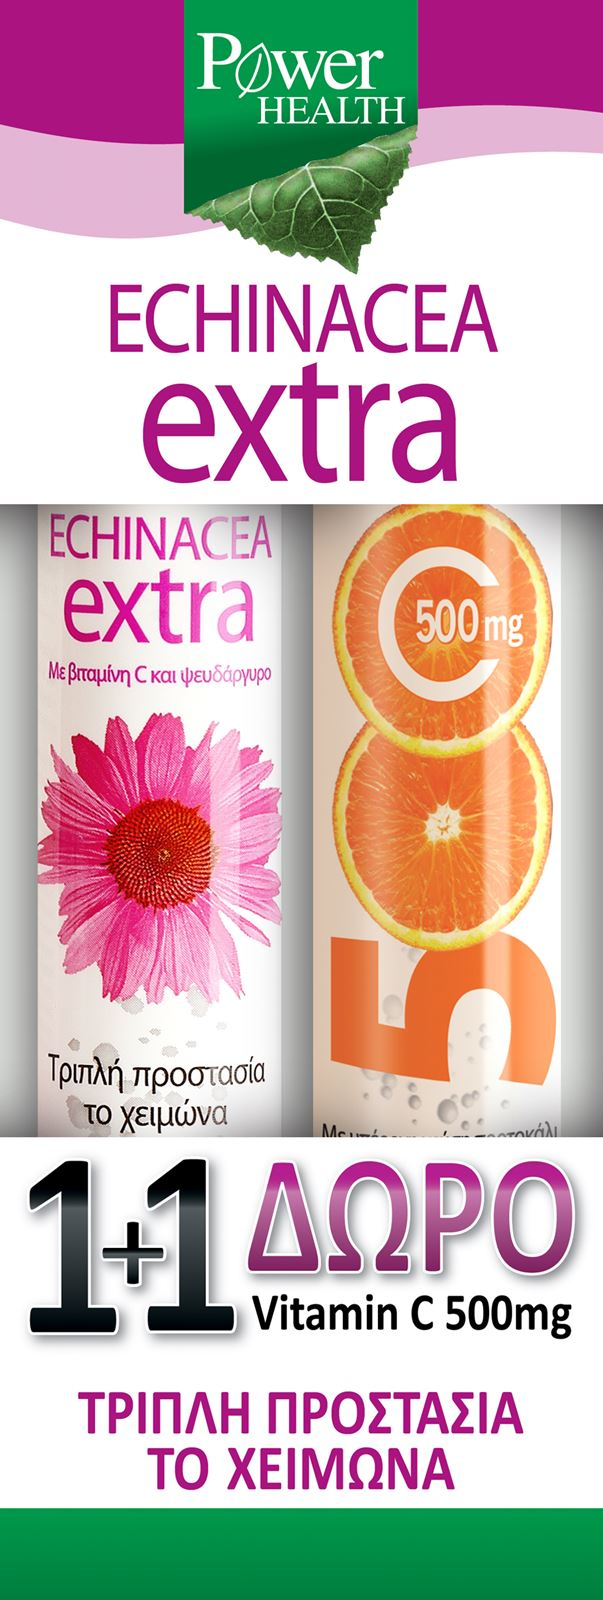 power health echinacea-extra-24tabs-doro-vitamin-c-500mg-20tabs.jpg